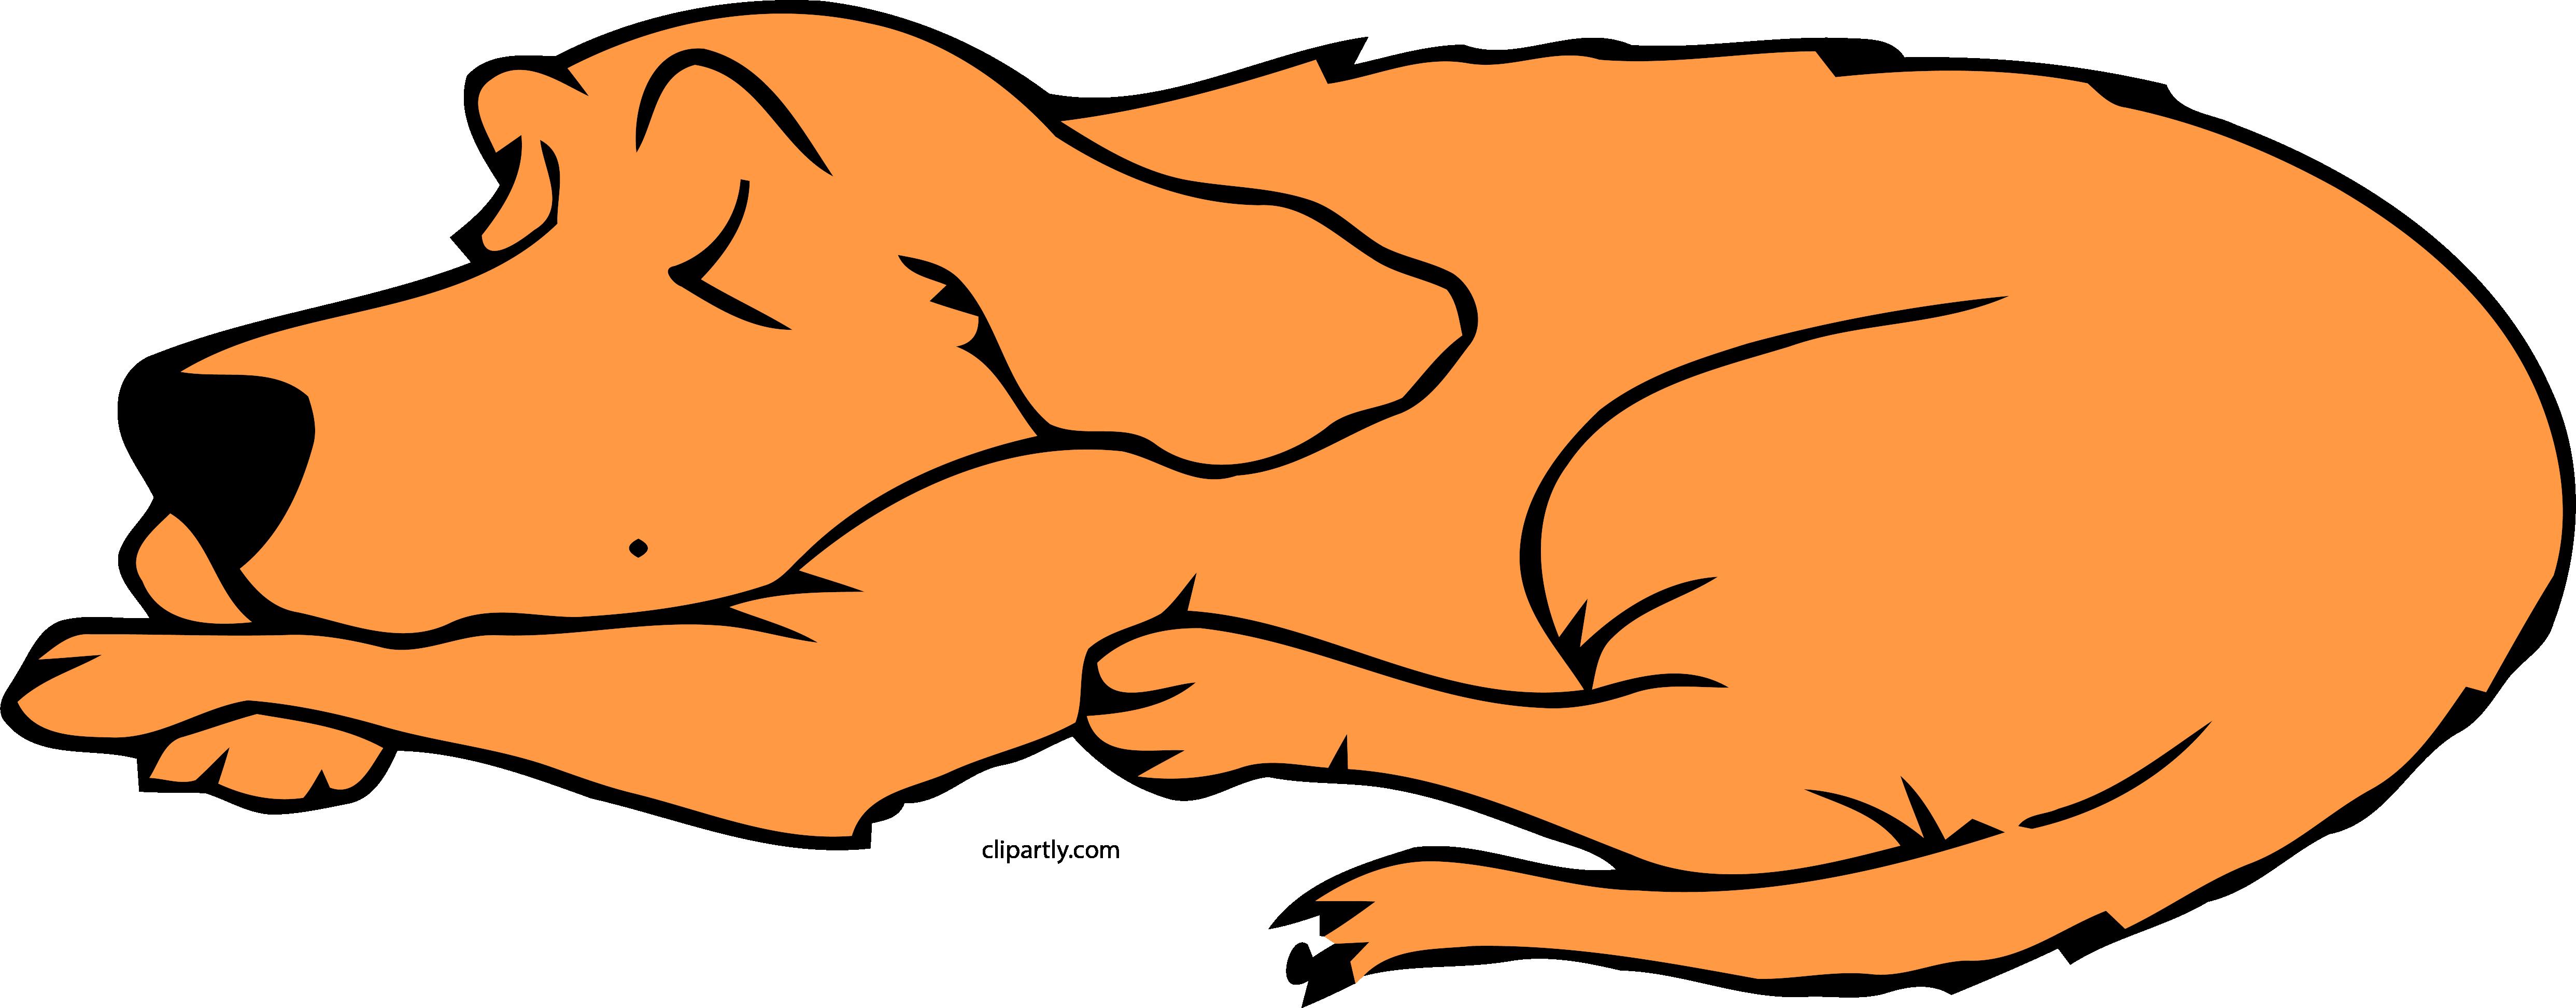 Dog clipart sleeping. Peru color png clip